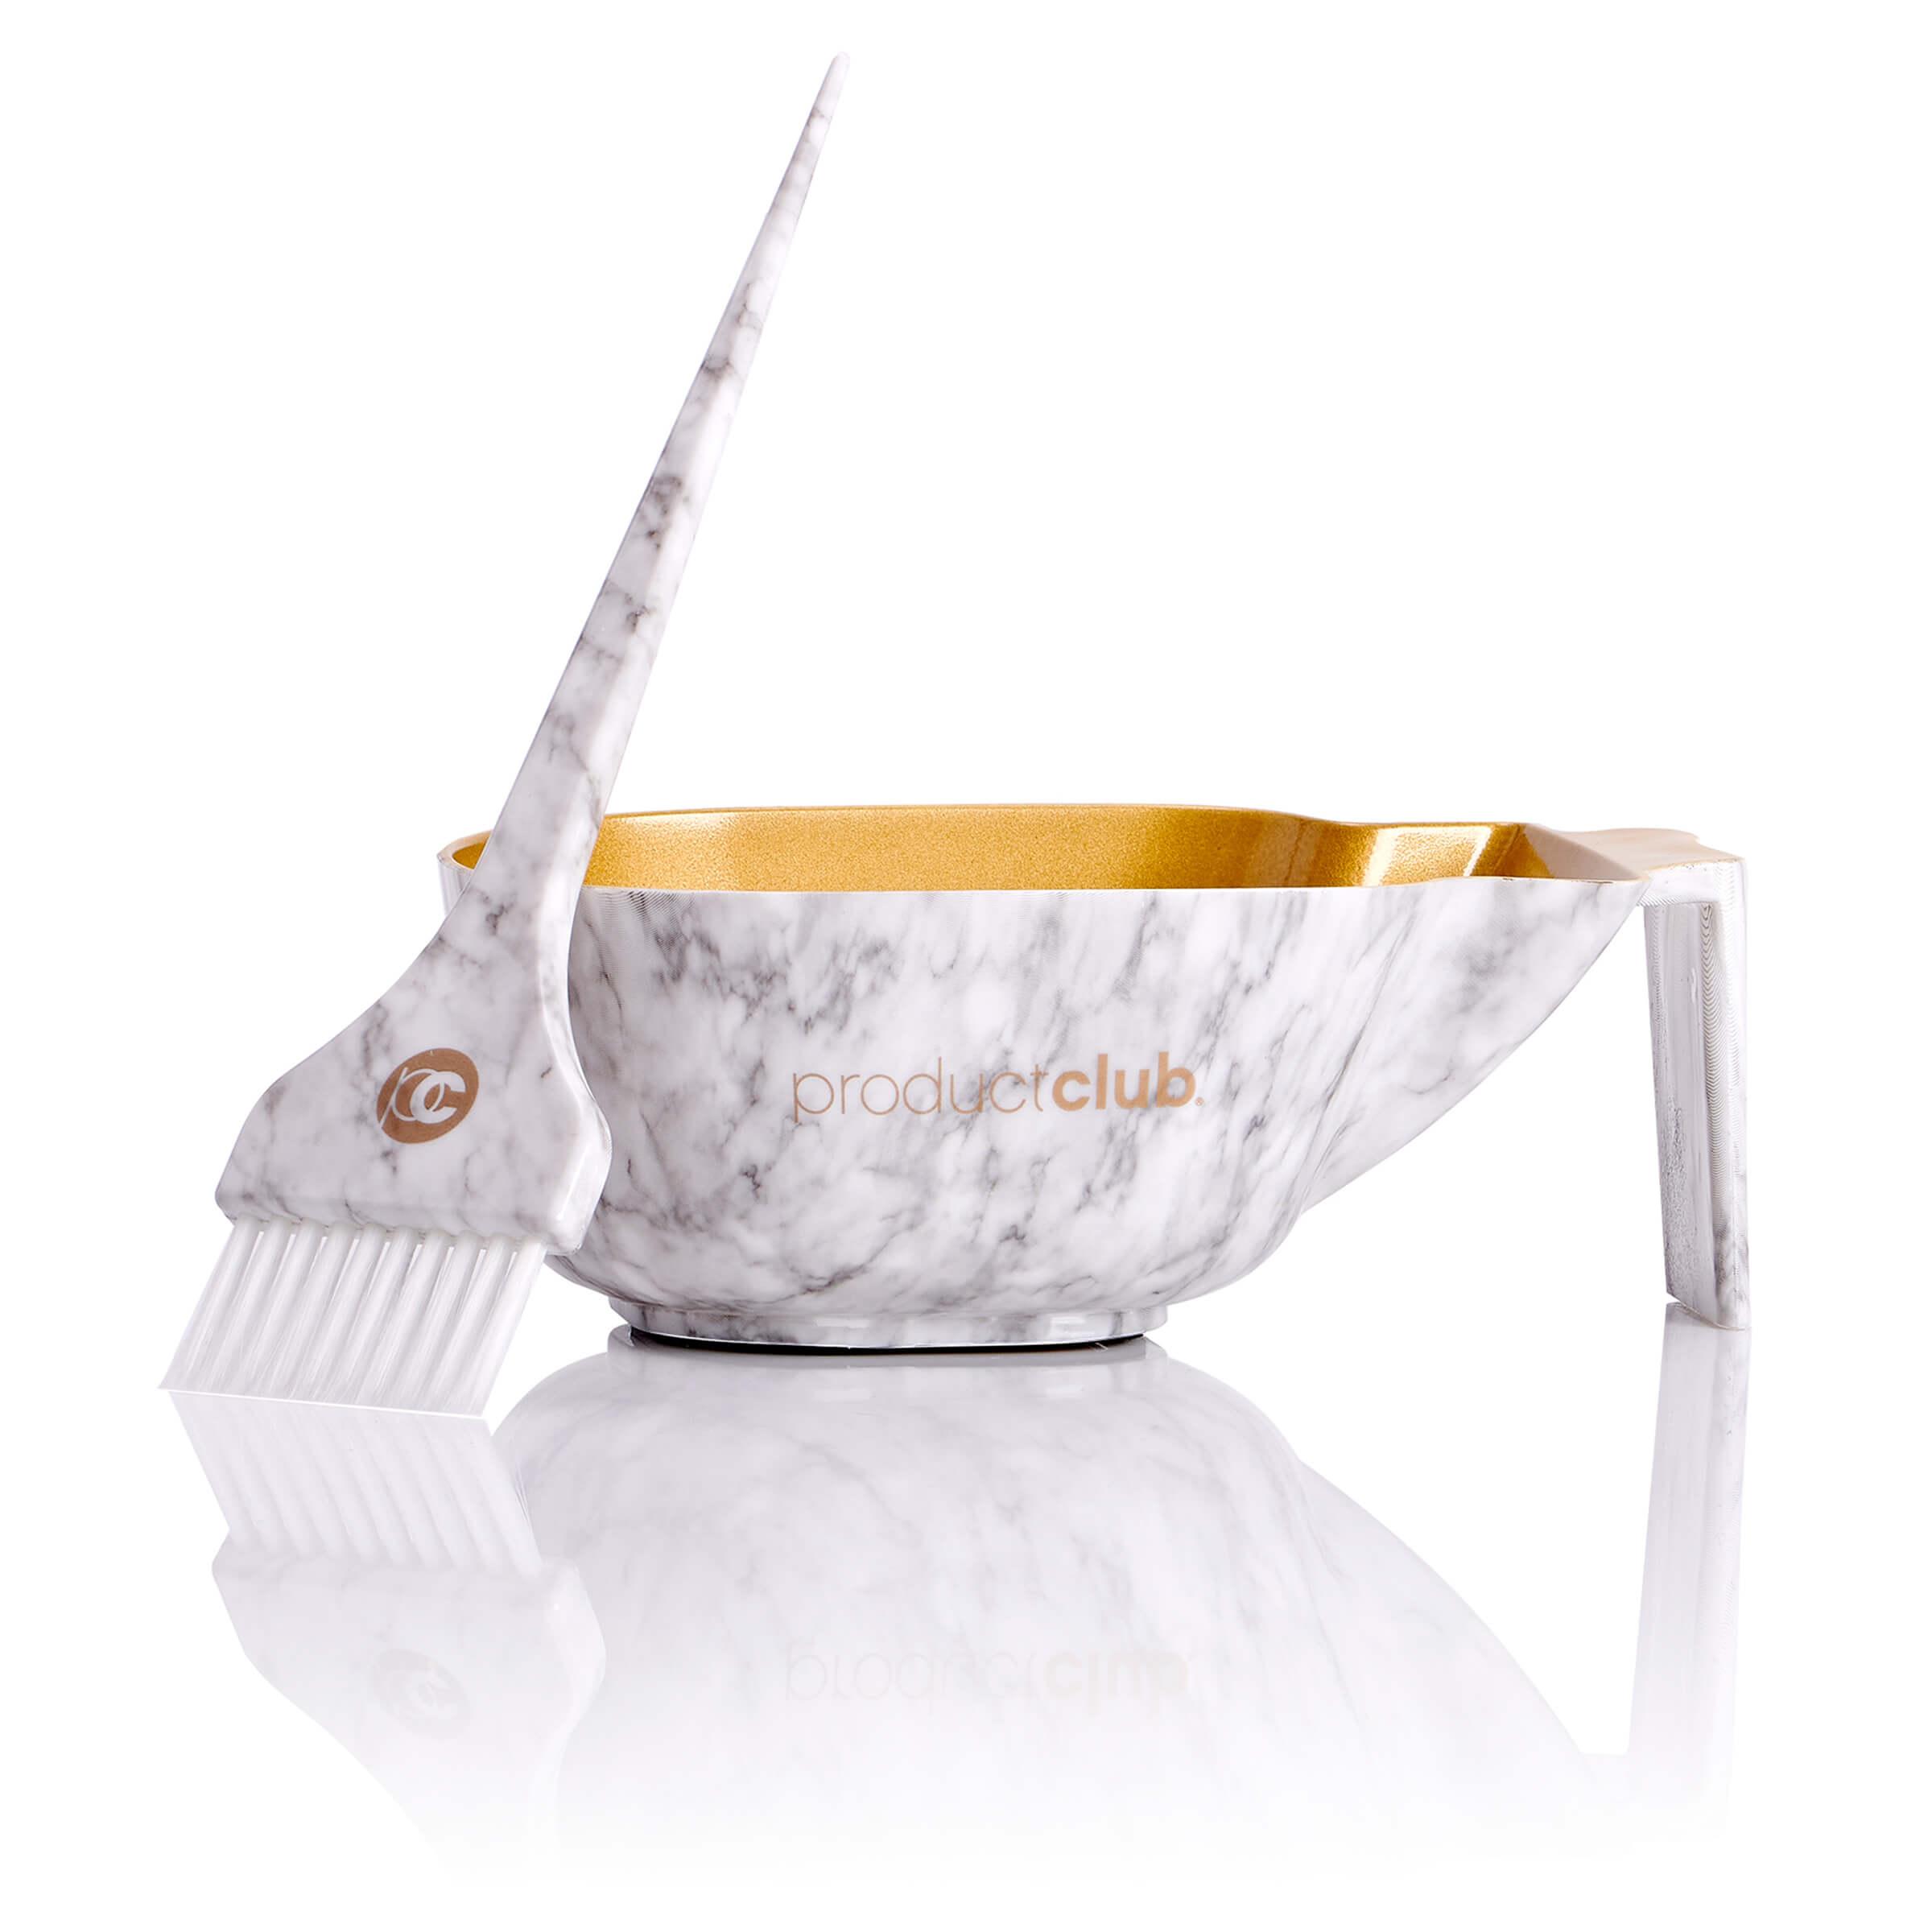 MBB-SET-a-artisan-colorist-bowl-brush-marble-l.jpg